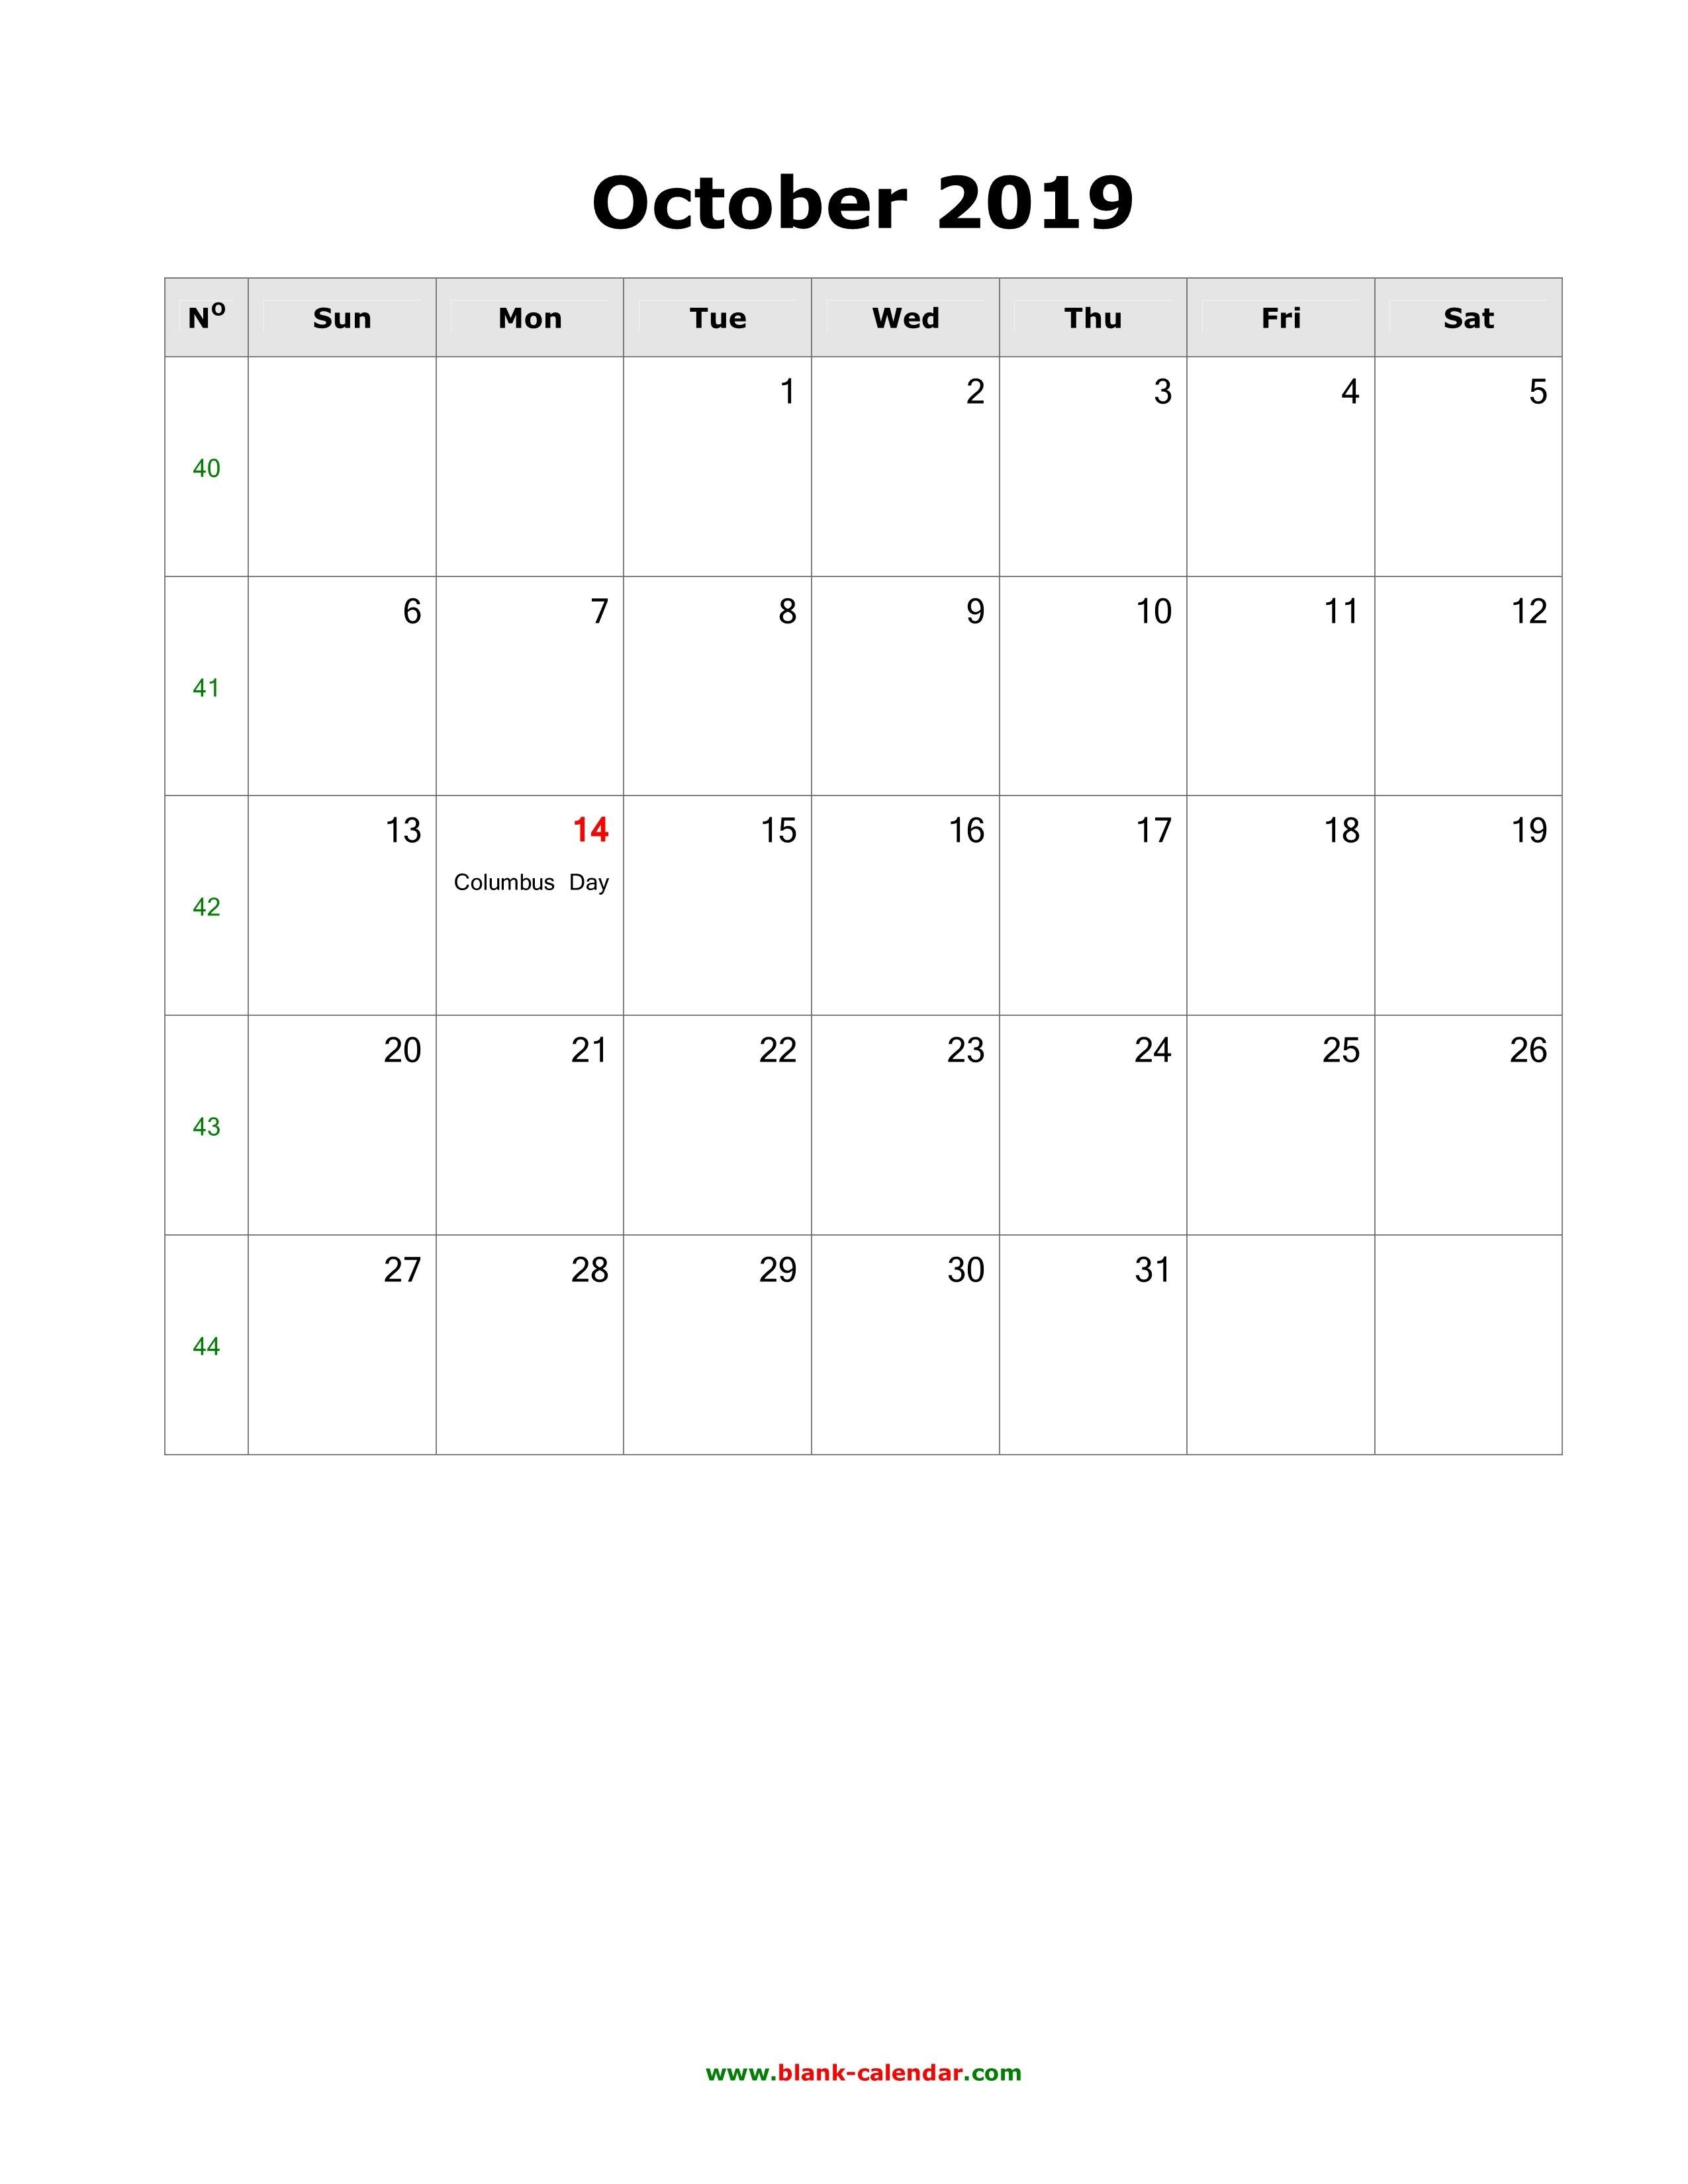 Download October 2019 Blank Calendar With Us Holidays (Vertical) Calendar 2019 October